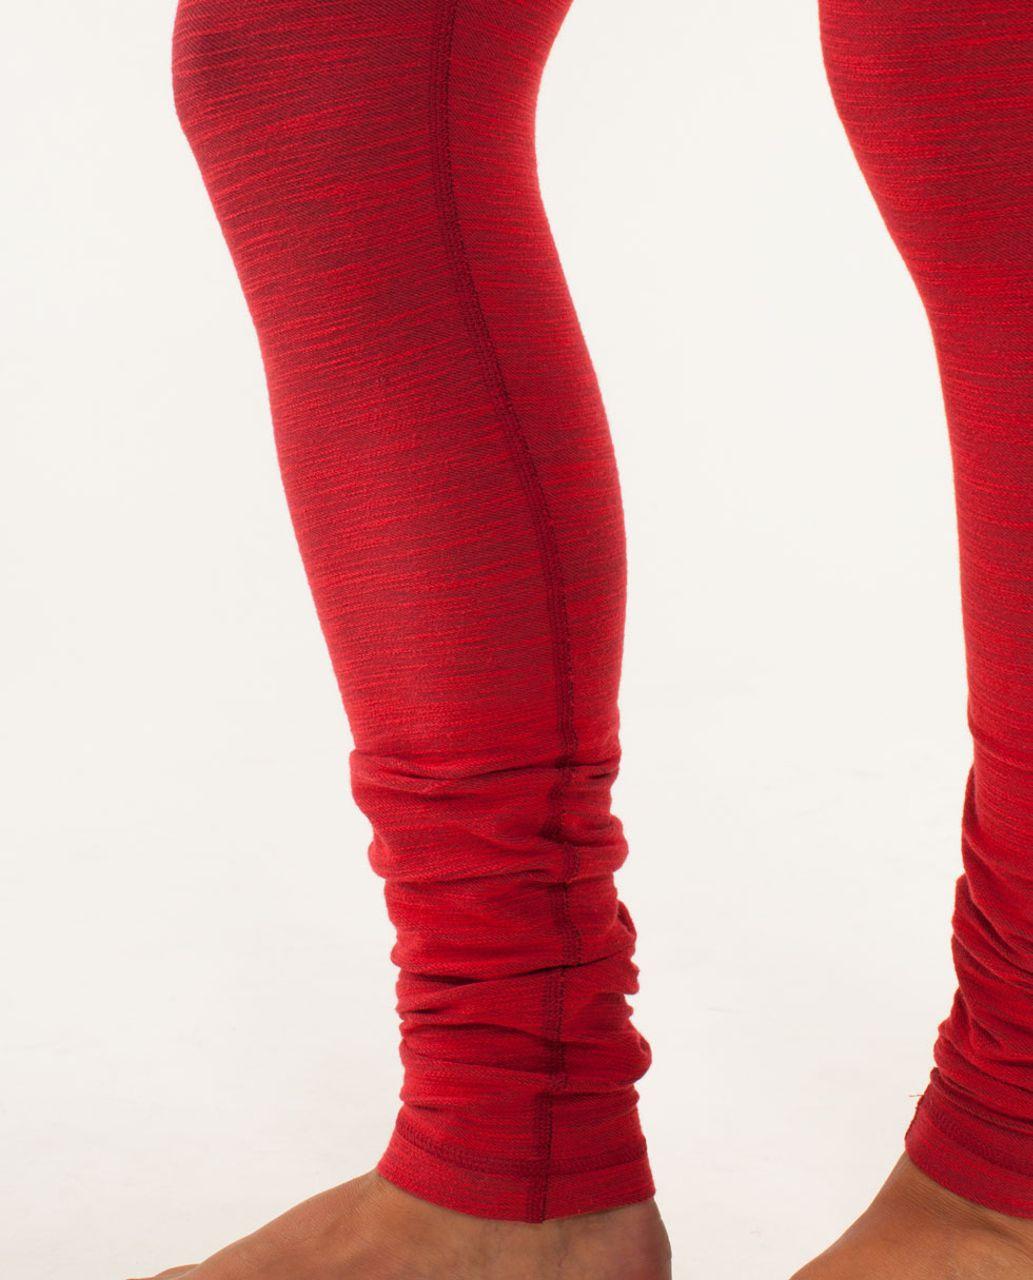 Lululemon Wunder Under Pant *Denim - Deepest Cranberry Slub Denim